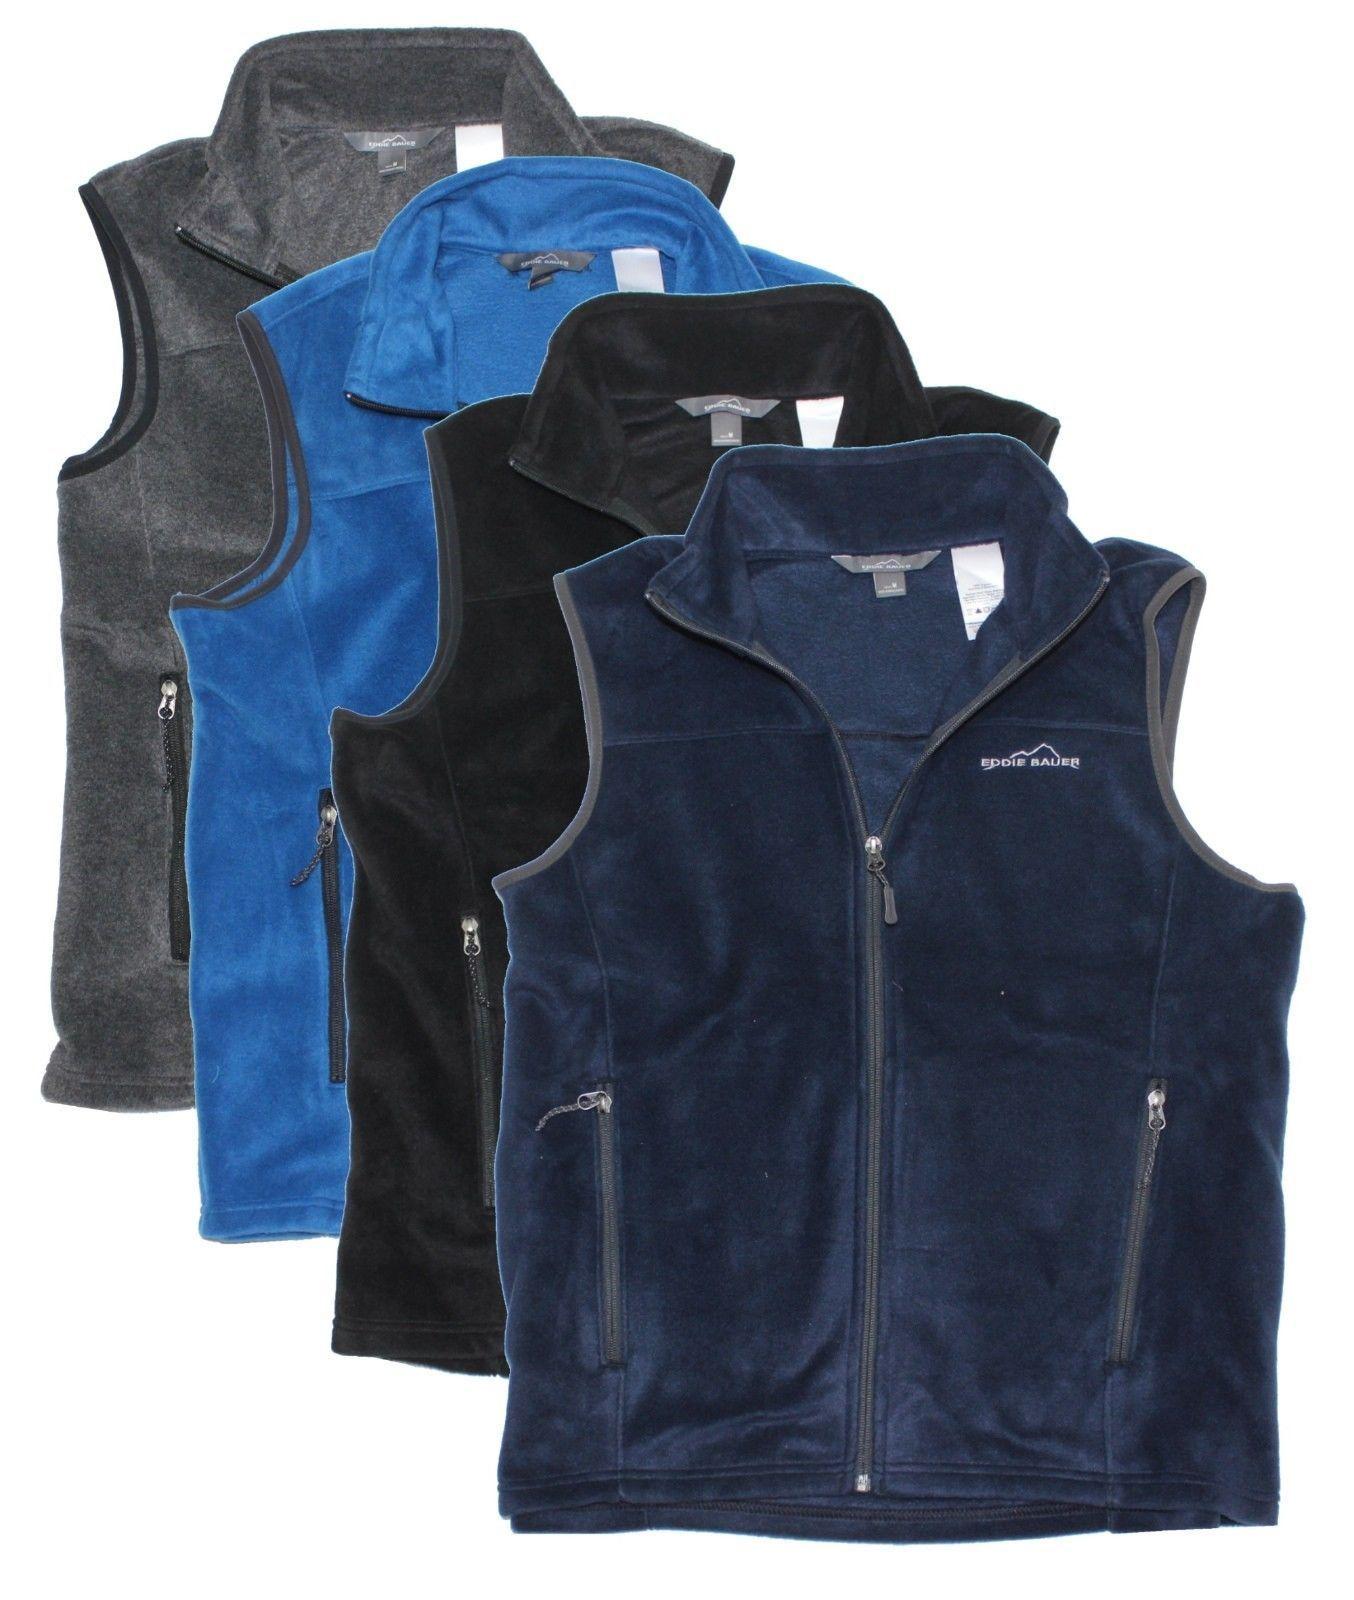 Flannel jacket with wool lining  Eddie Bauer menus fleece vest  Menus Autumn and Winter fashions for